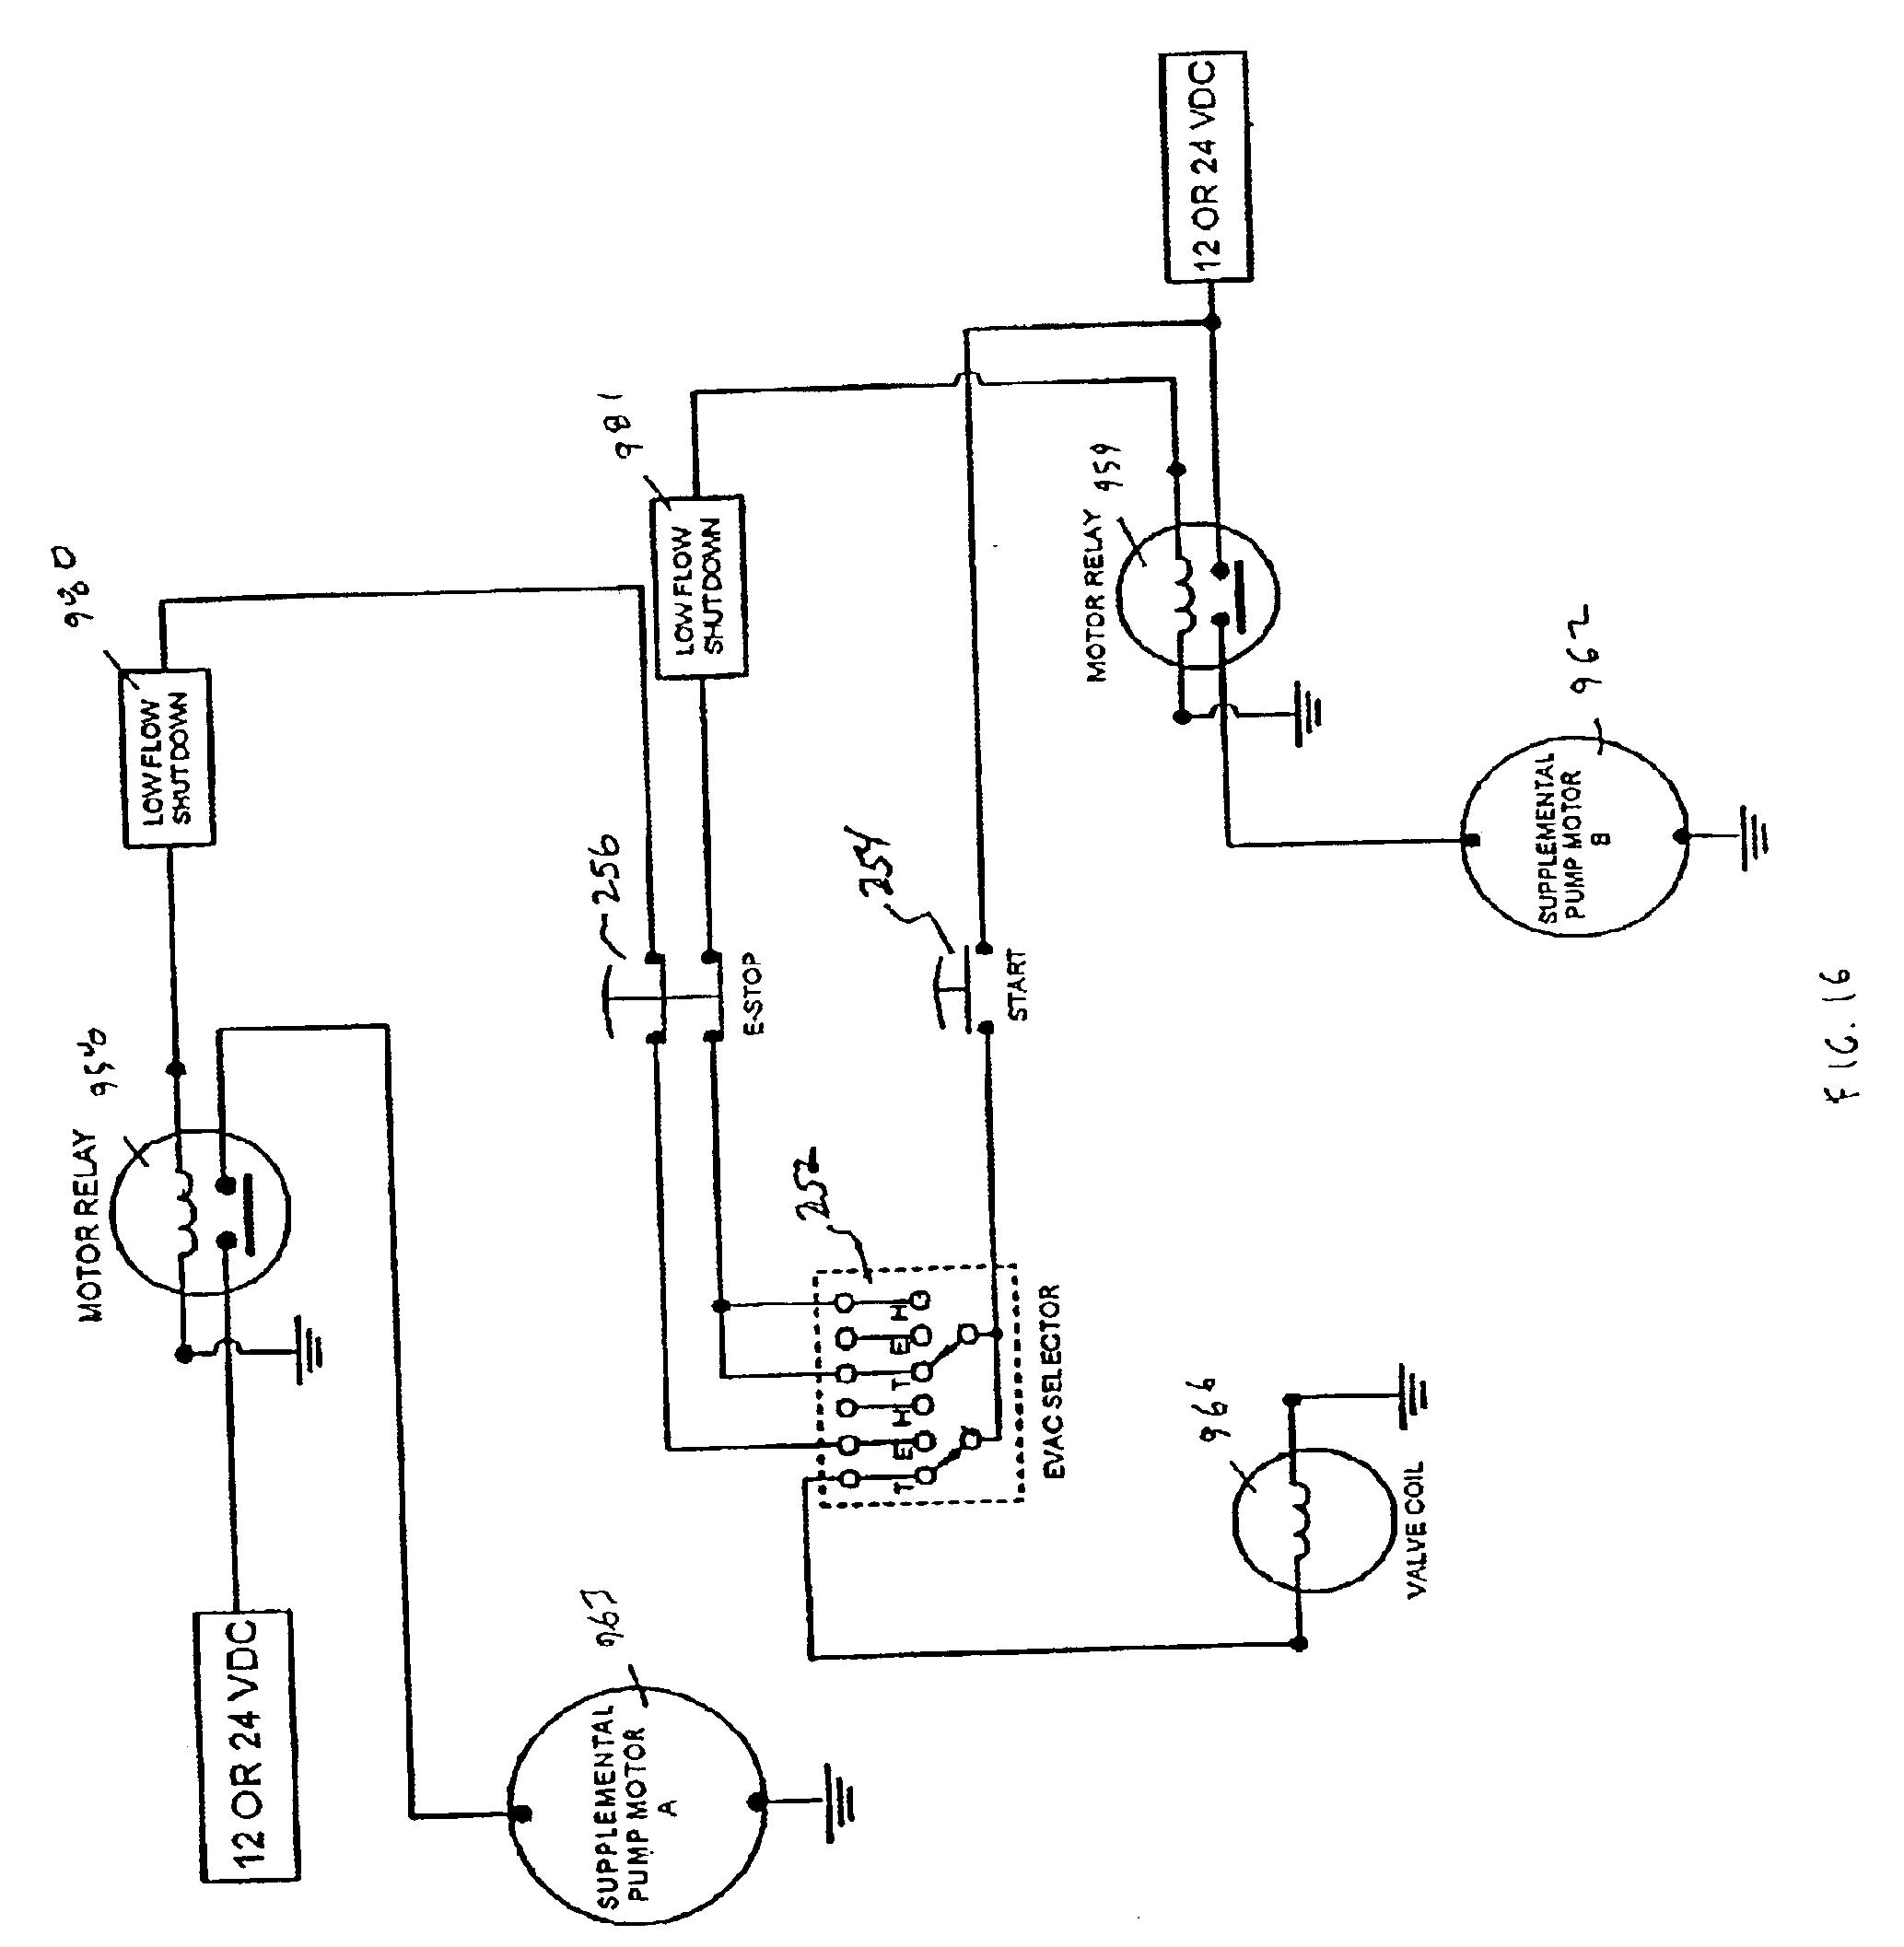 [SCHEMATICS_4ER]  WC_7860] 574 International Tractor Wiring Diagram Wiring Diagram | International 464 Tractor Wiring Diagram |  | Weveq Magn Jidig Inama Mohammedshrine Librar Wiring 101